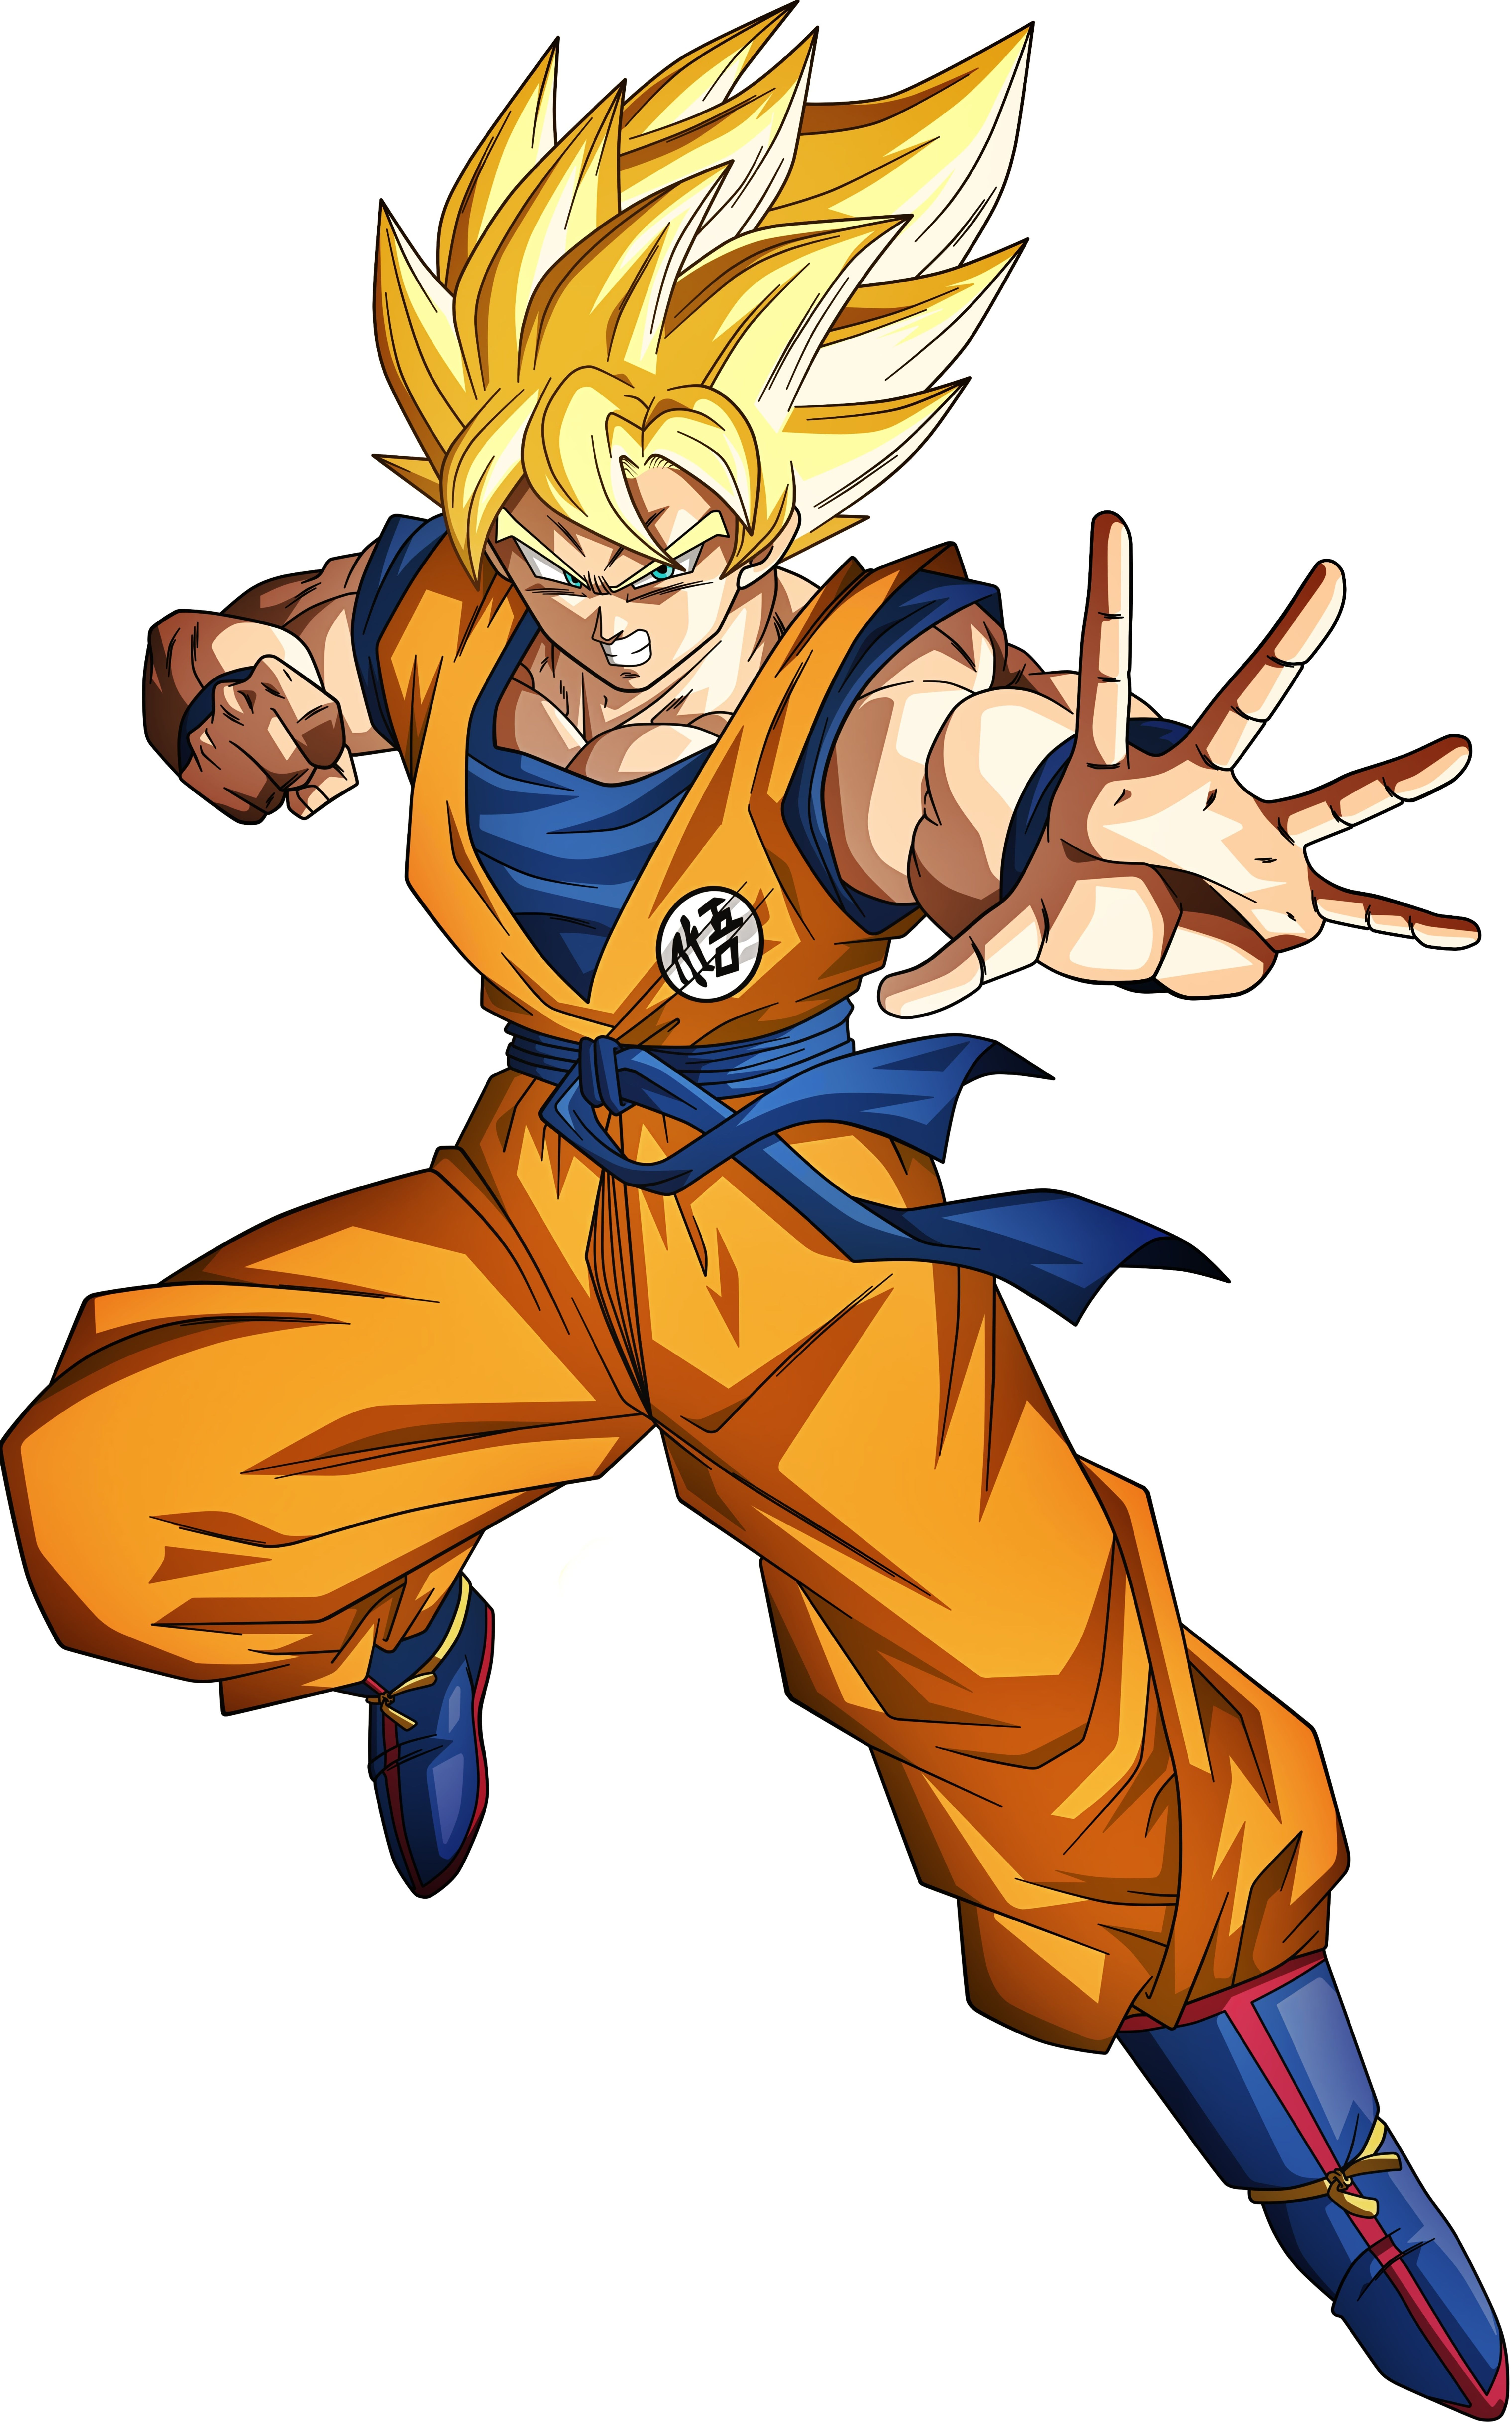 Goku Ssj Universo 7 Anime Dragon Ball Super Dragon Ball Super Manga Dragon Ball Goku